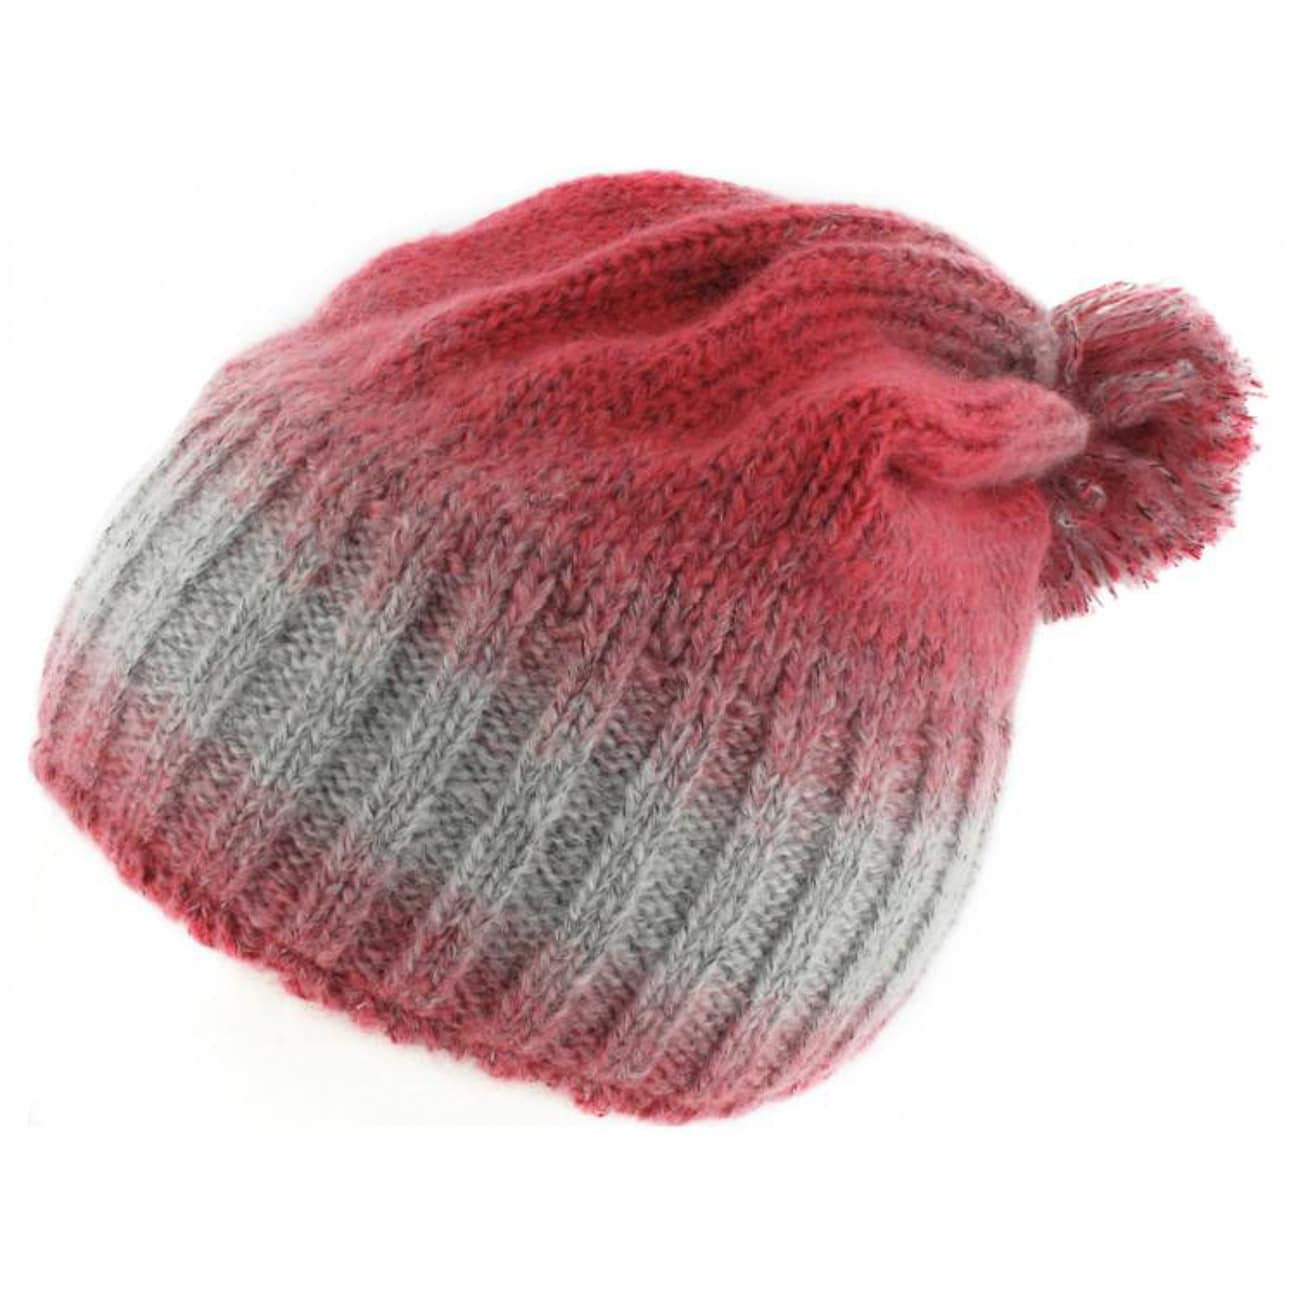 ... Sloane Bobble Hat by PUMA - 1 814de2049bd